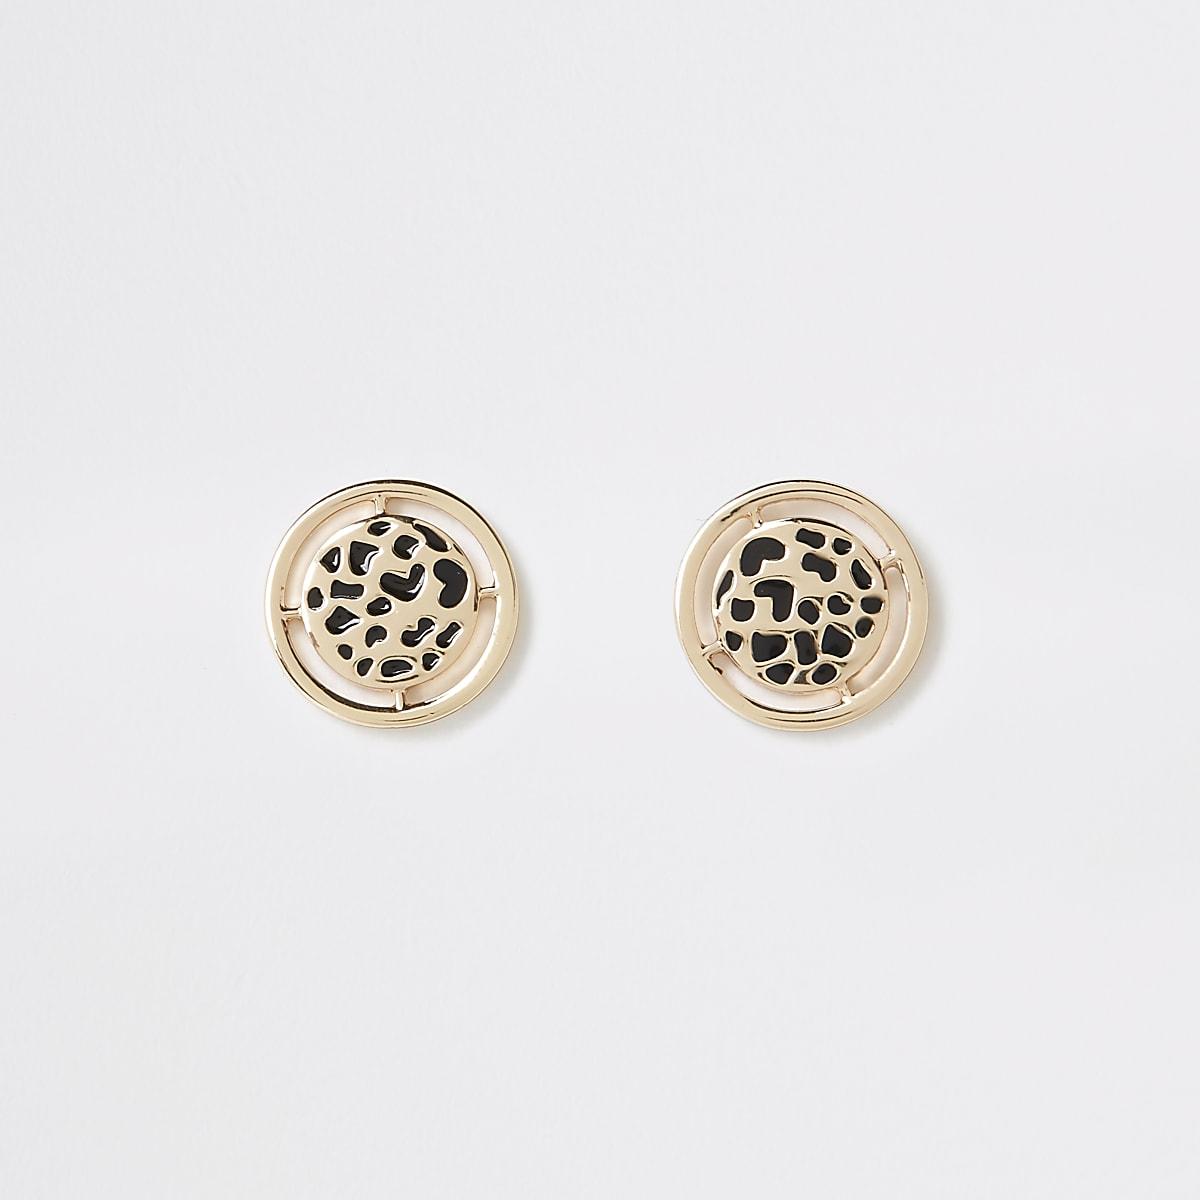 Gold colour leopard design stud earrings